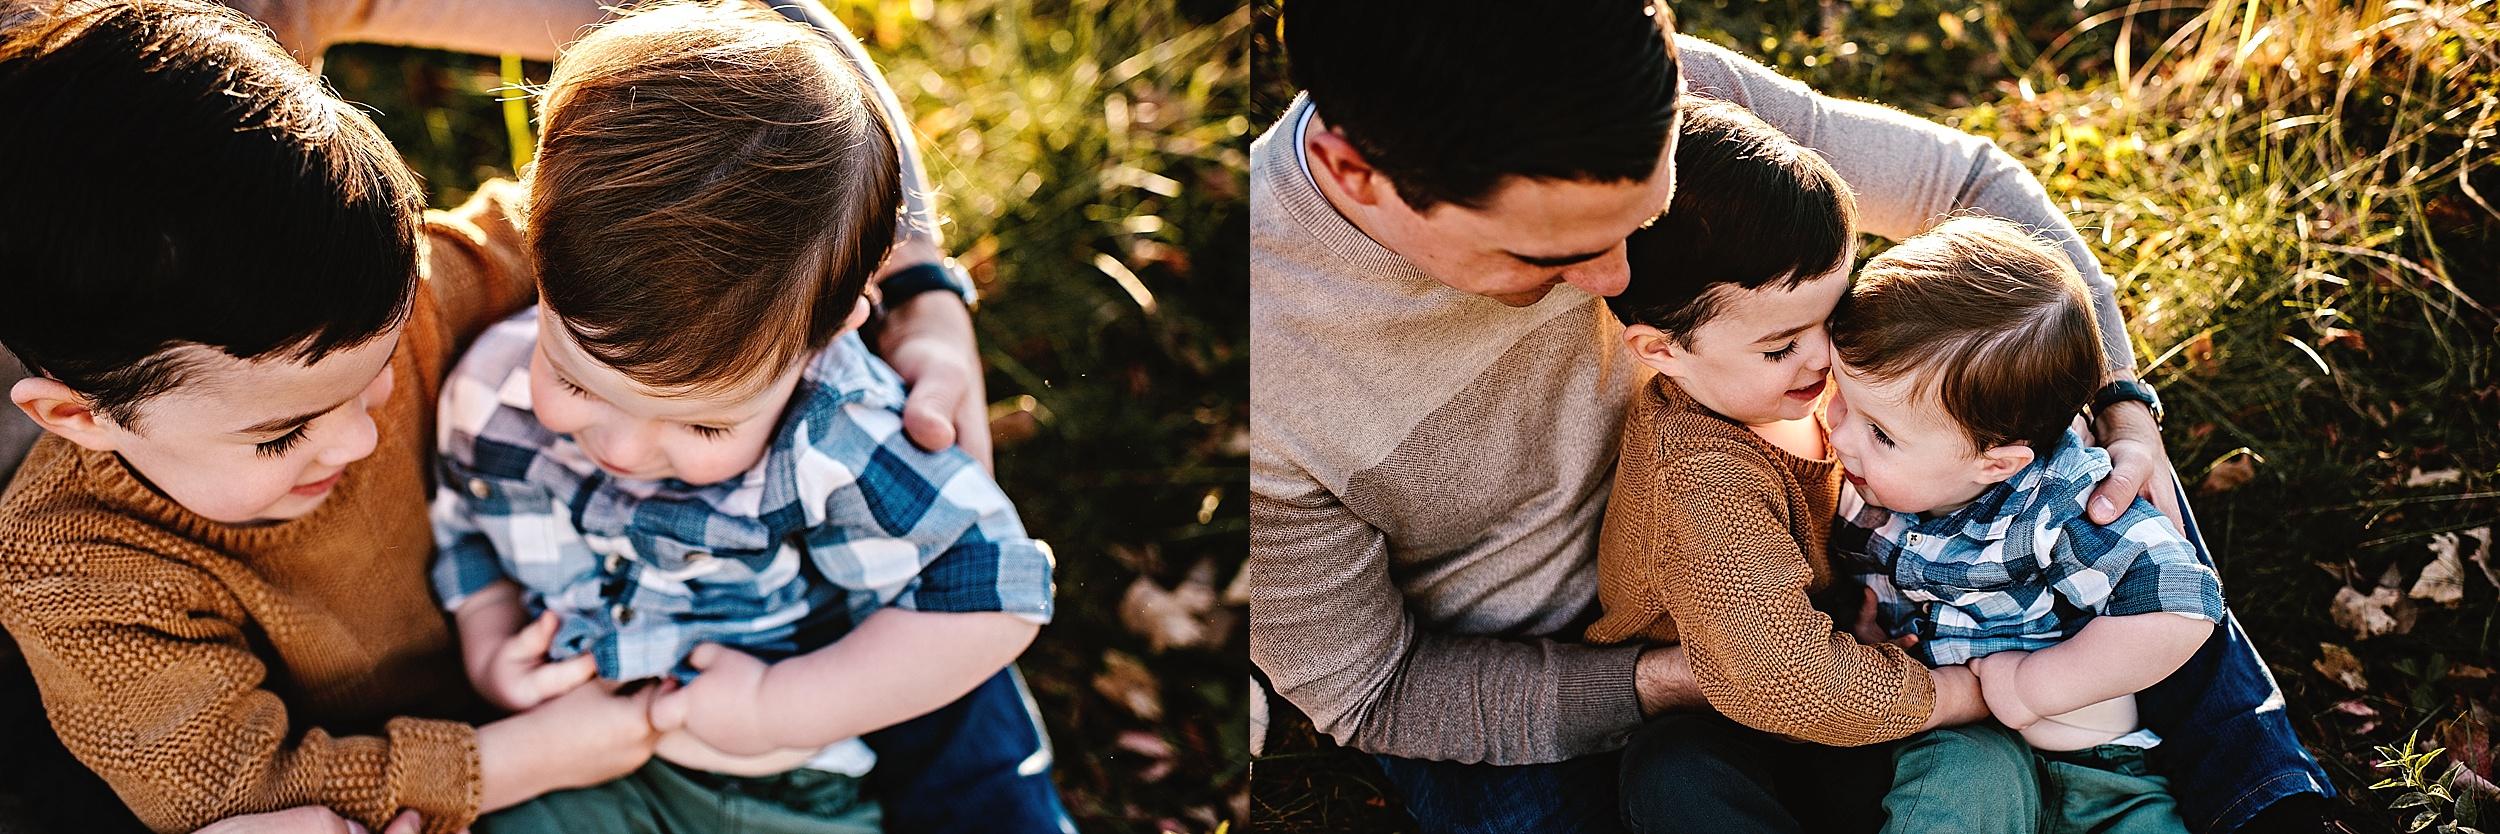 lauren-grayson-photography-portrait-artist-akron-cleveland-ohio-photographer-family-session-fields-sunset-fall_0176.jpg